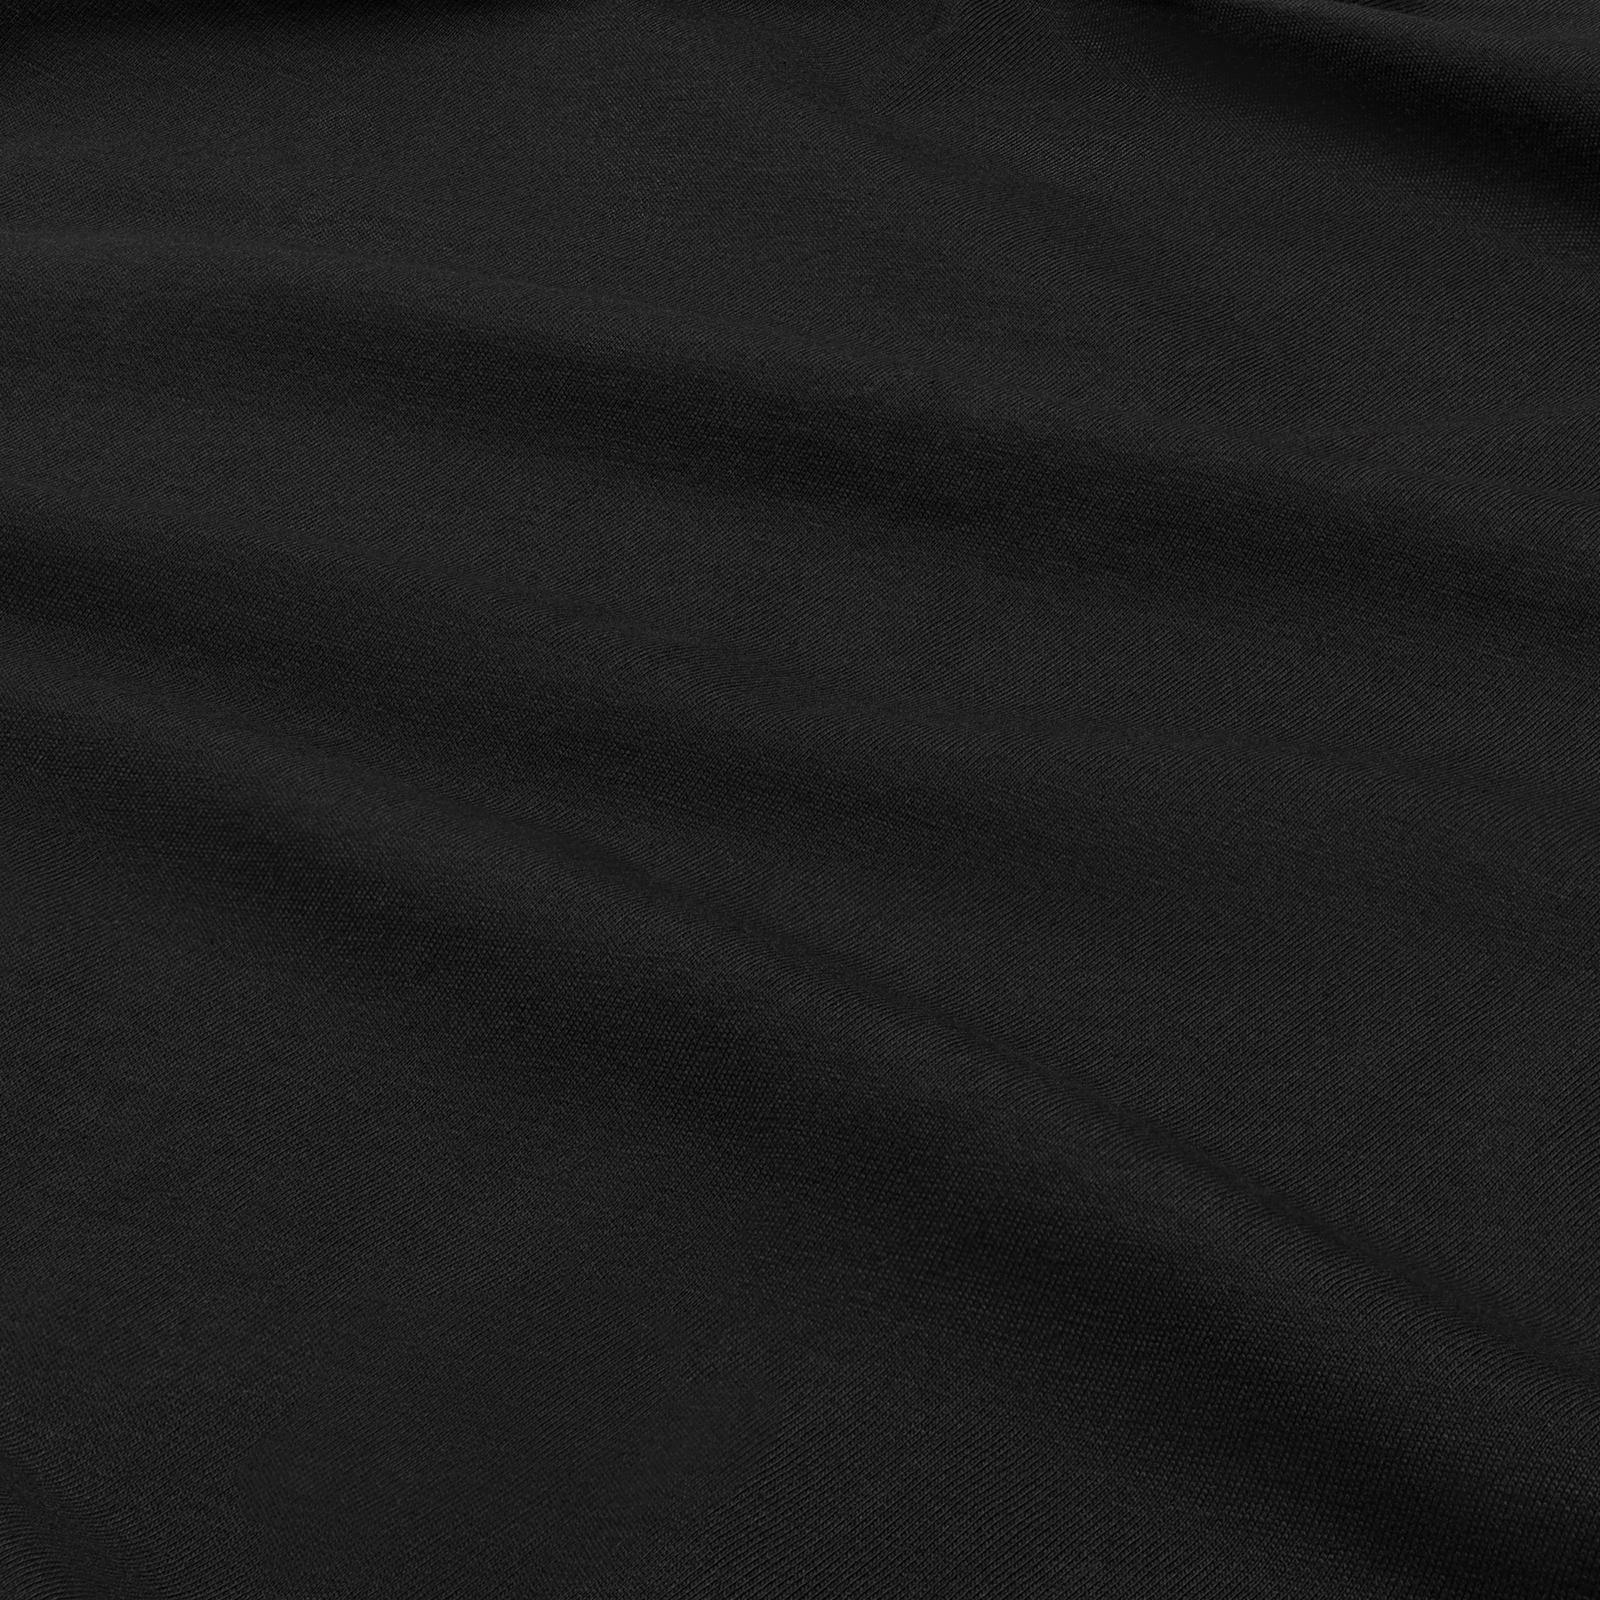 Fabrics close up product photography